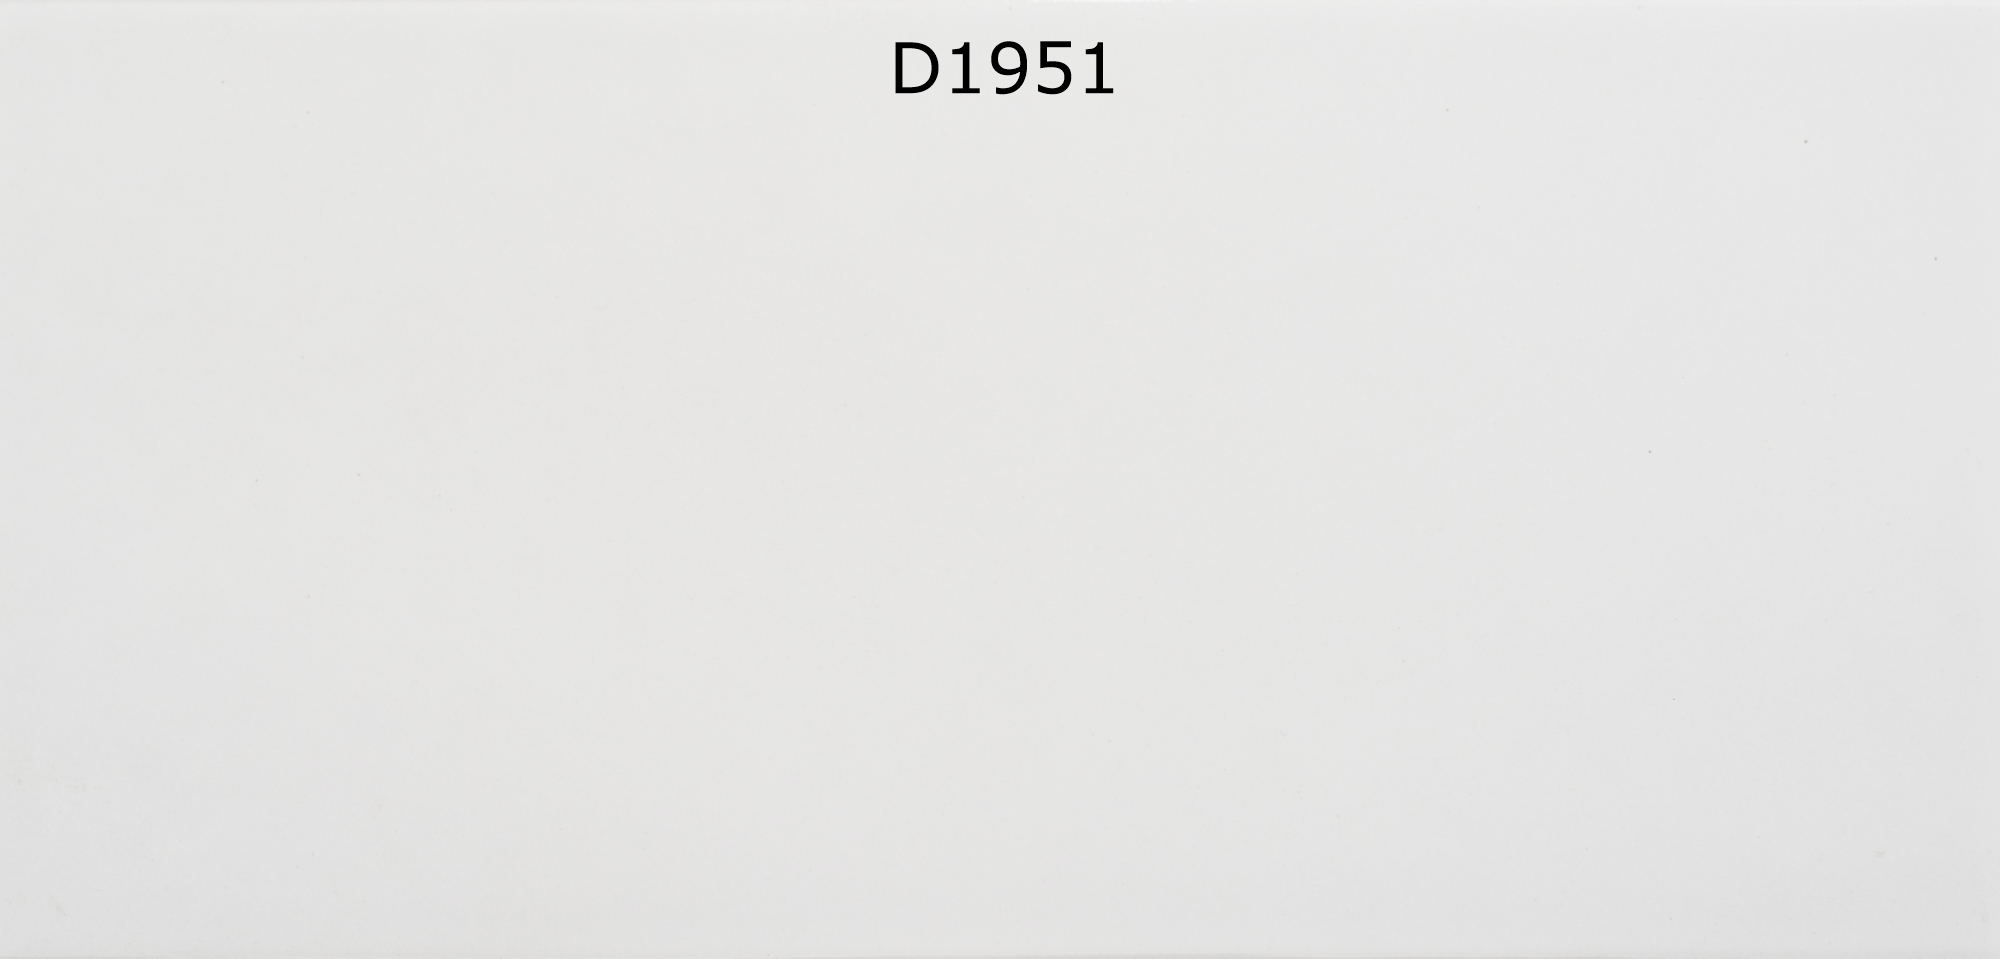 D1951